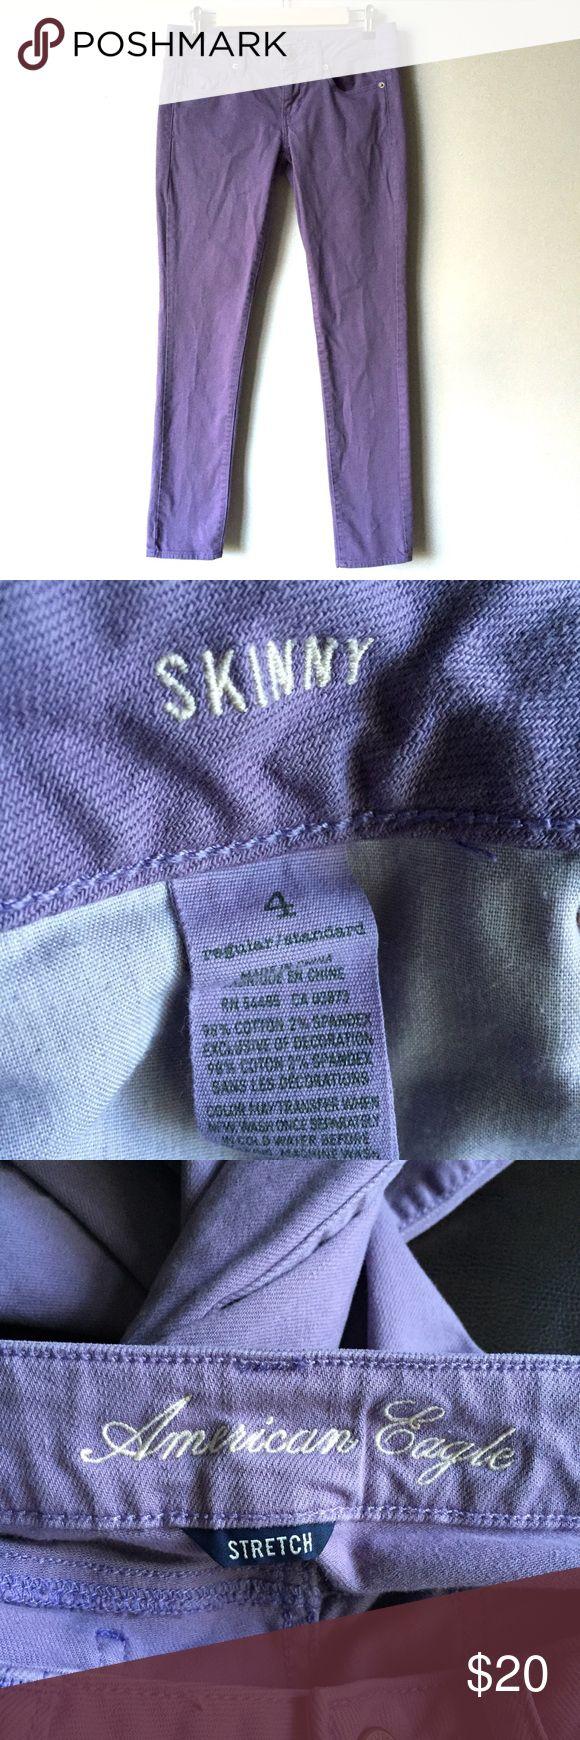 American Eagle Lavender Purple Skinny Jeans Size 4 American Eagle Lavender Purple Skinny Jeans. Size 4 regular. 98% cotton, 2% spandex. Excellent condition. American Eagle Outfitters Jeans Skinny